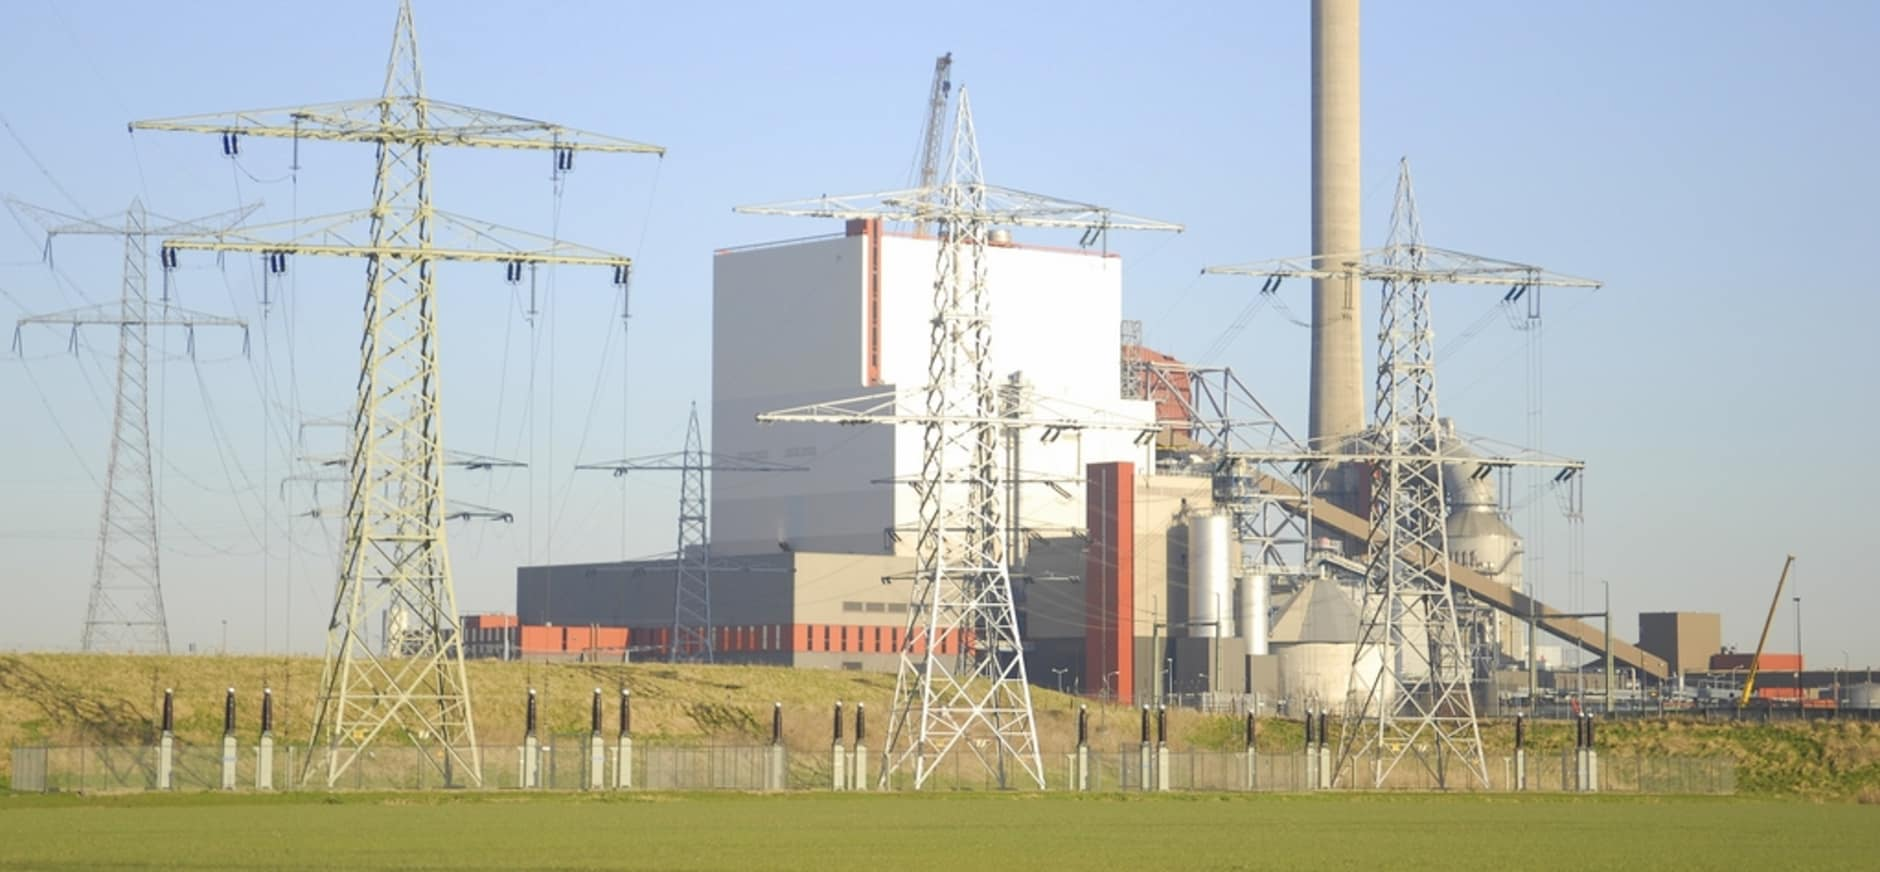 Natuurmonumenten teleurgesteld over kolencentrale bij Waddenzee